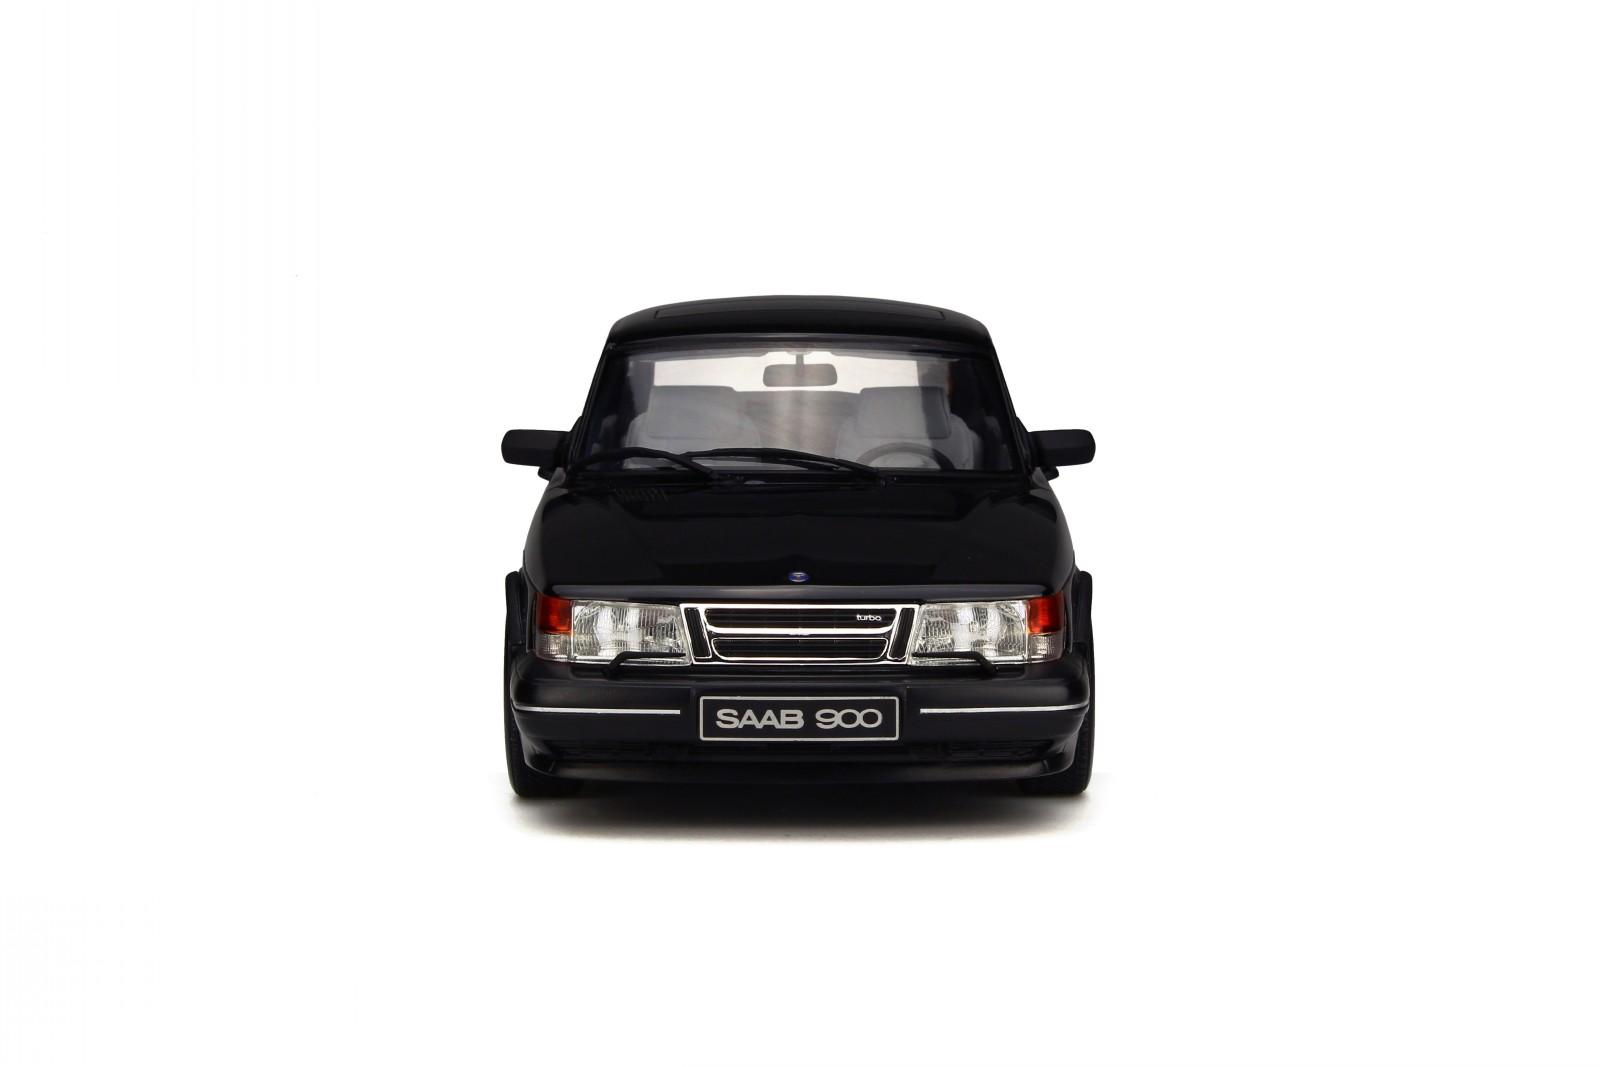 Saab-900-Turbo-Phase-1-black-resin-modelcar-OT678-Otto-1-18 thumbnail 3